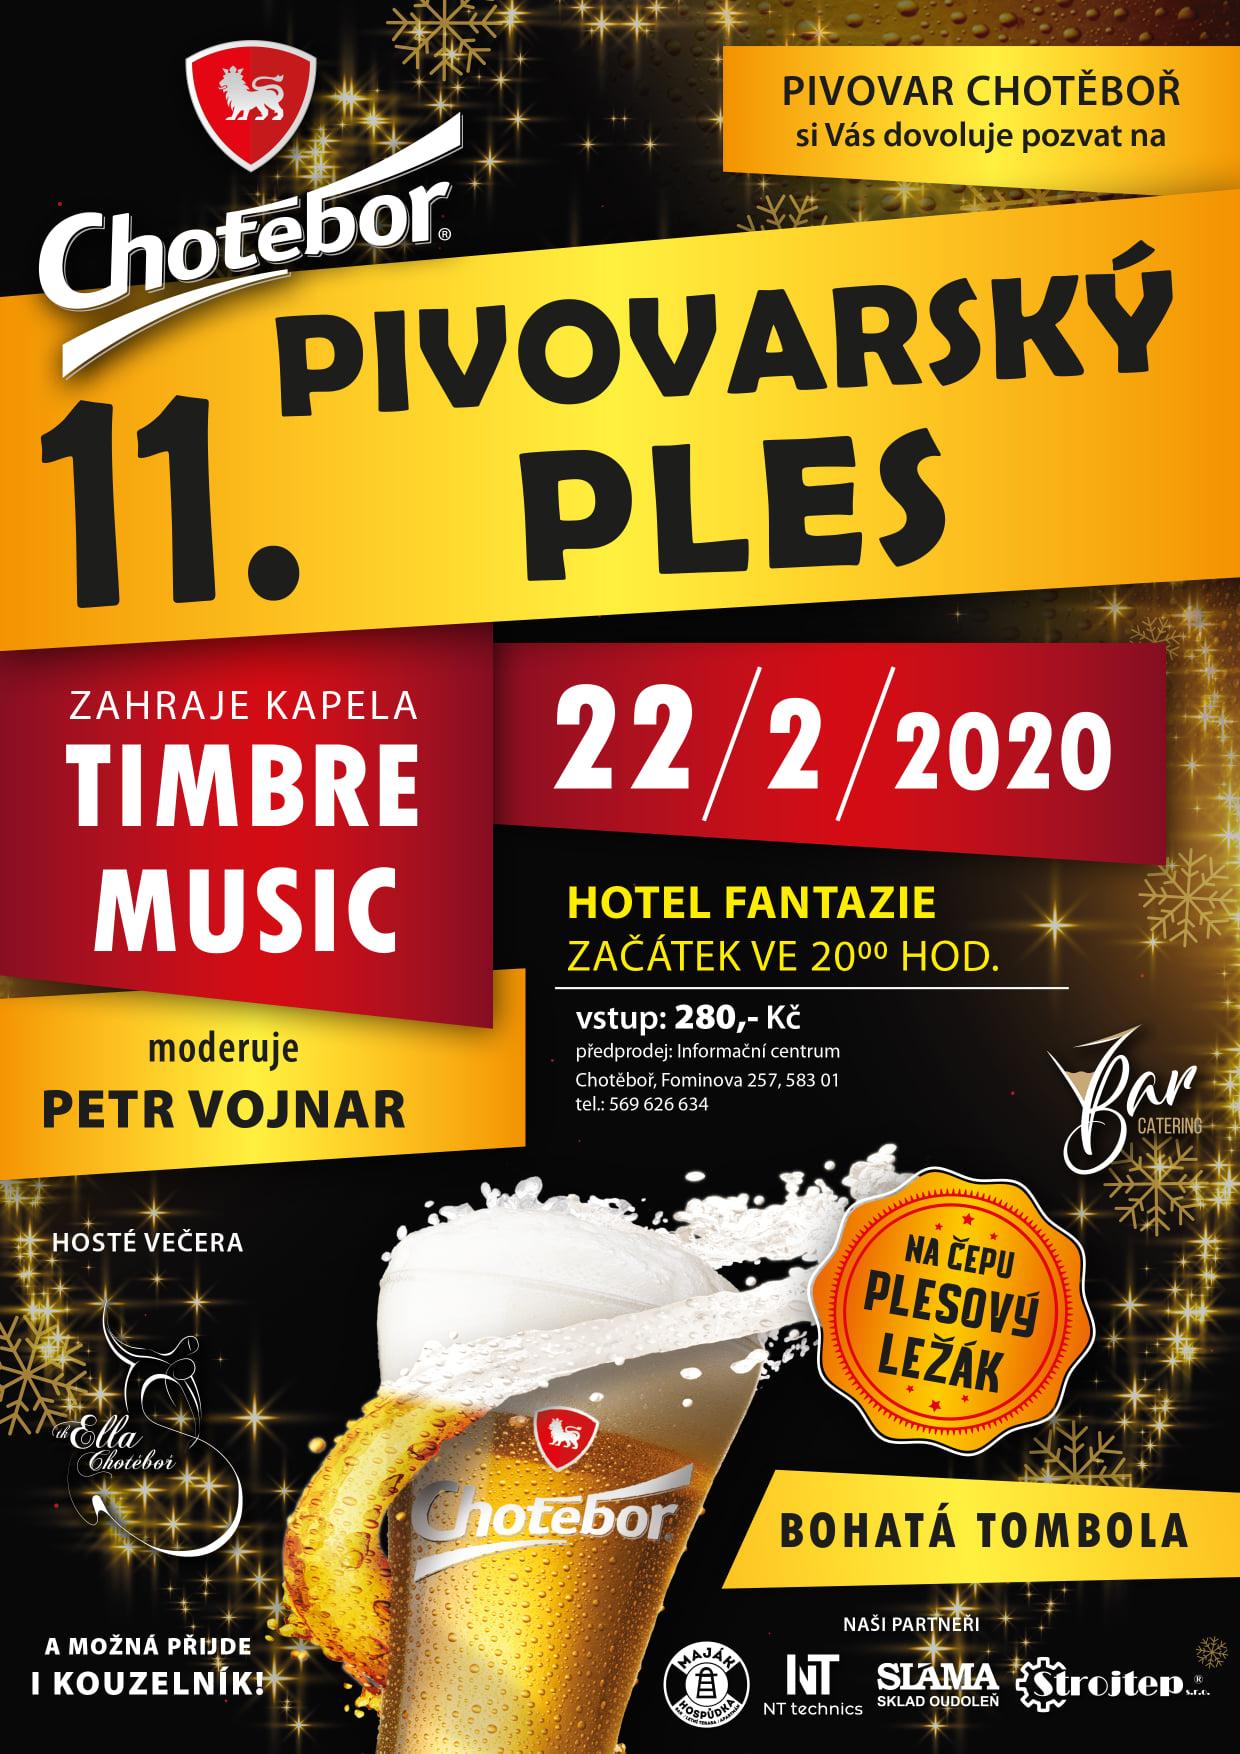 pivovary-pivni-akce-pivovarsky-ples-chotebor-2020